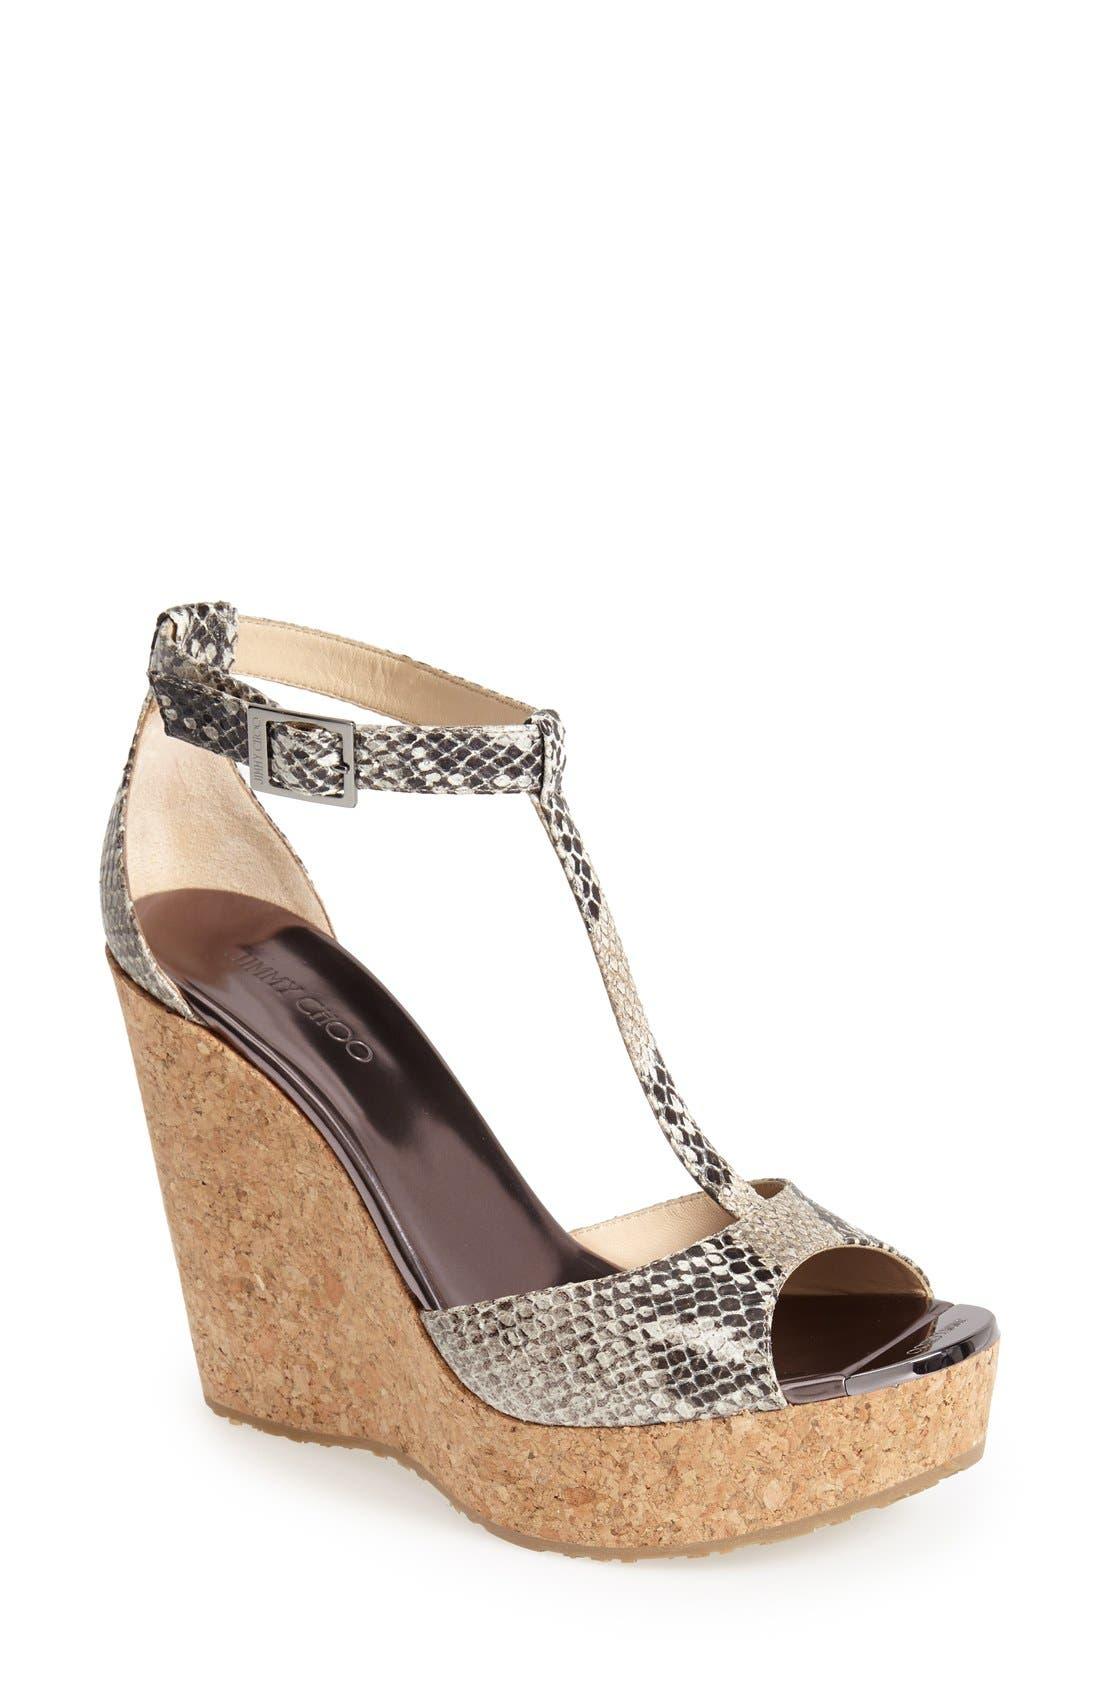 Main Image - Jimmy Choo 'Pela' Leather Wedge Sandal (Women)